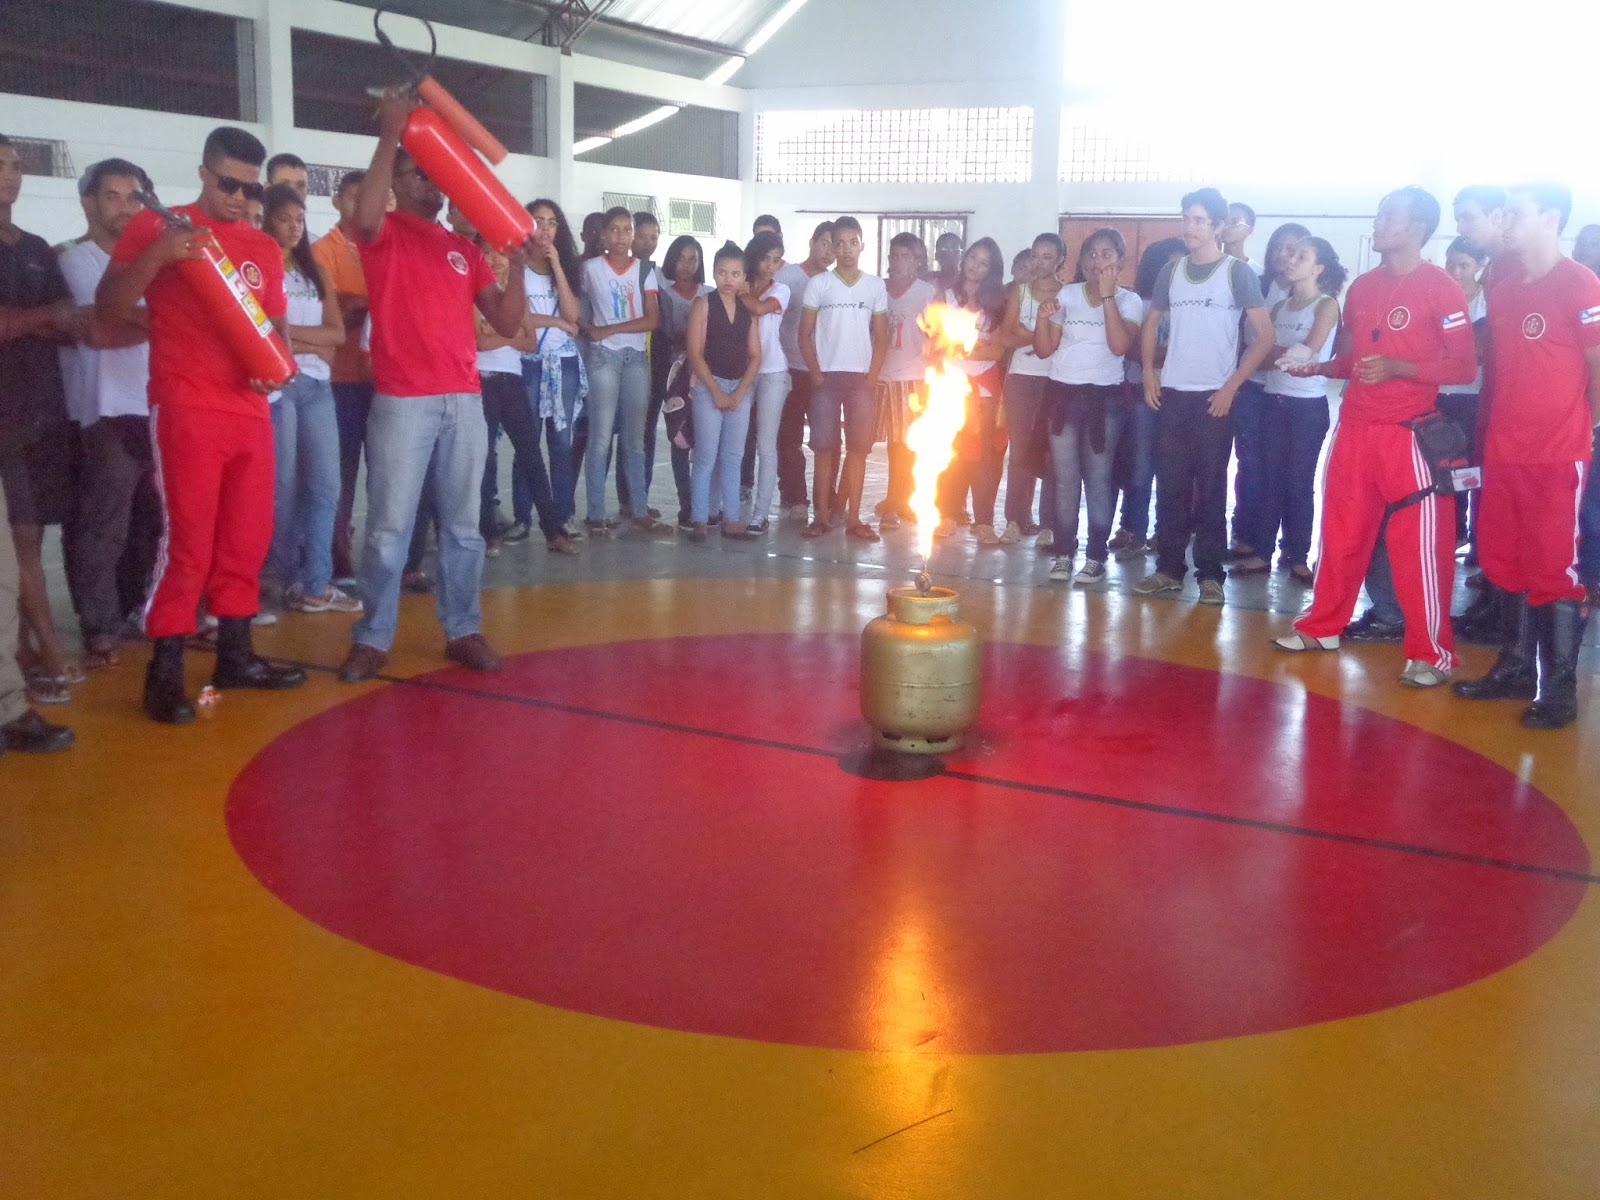 ifba-valenca-realiza-2o-oficina-de-combate-a-incendios-e-primeiros-socorros